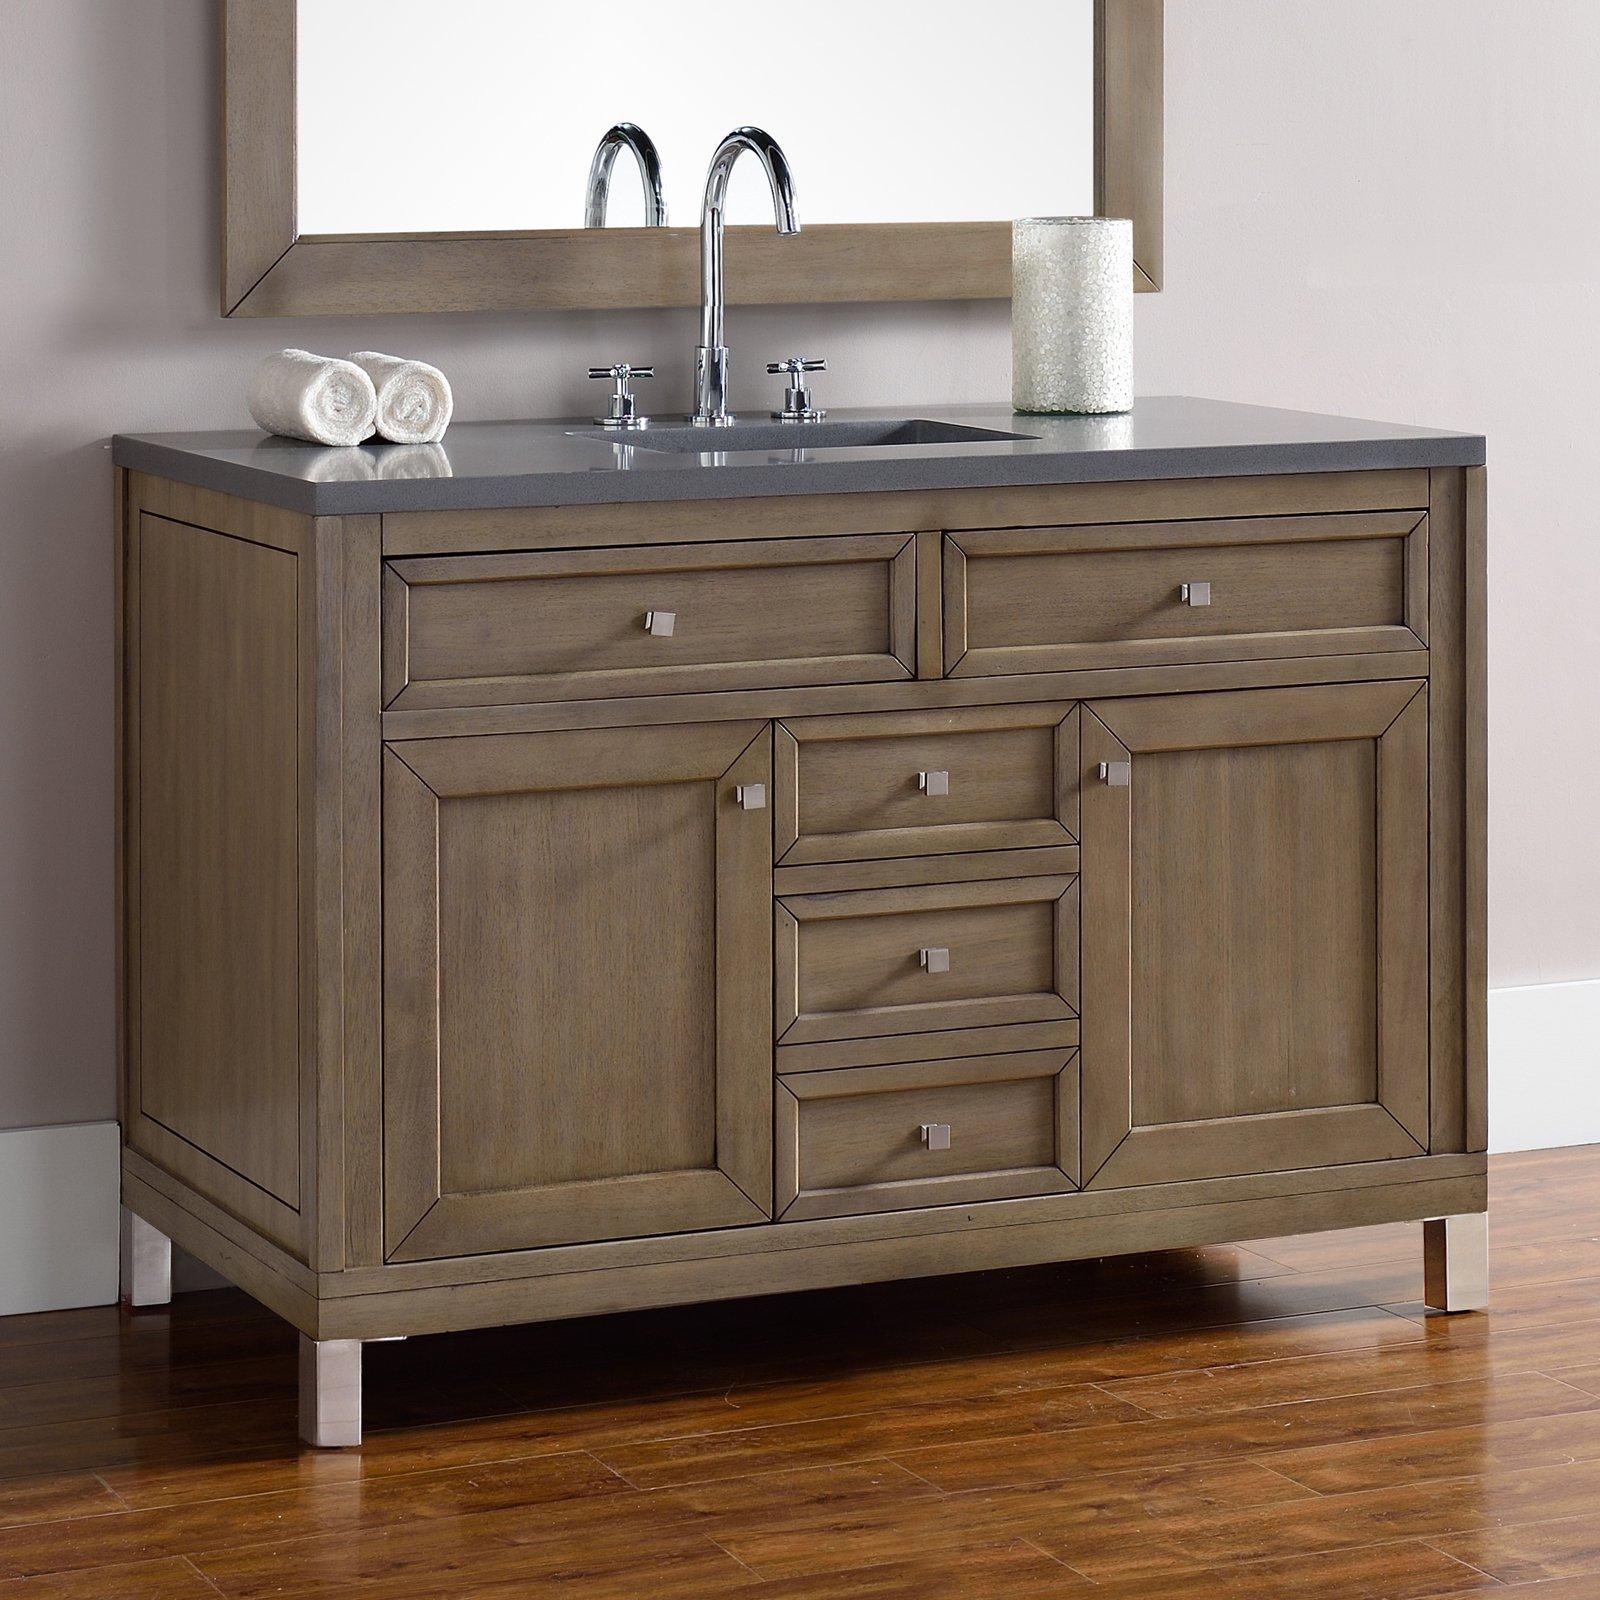 James Martin Chicago 48 In Single Bathroom Vanity Walmart Com